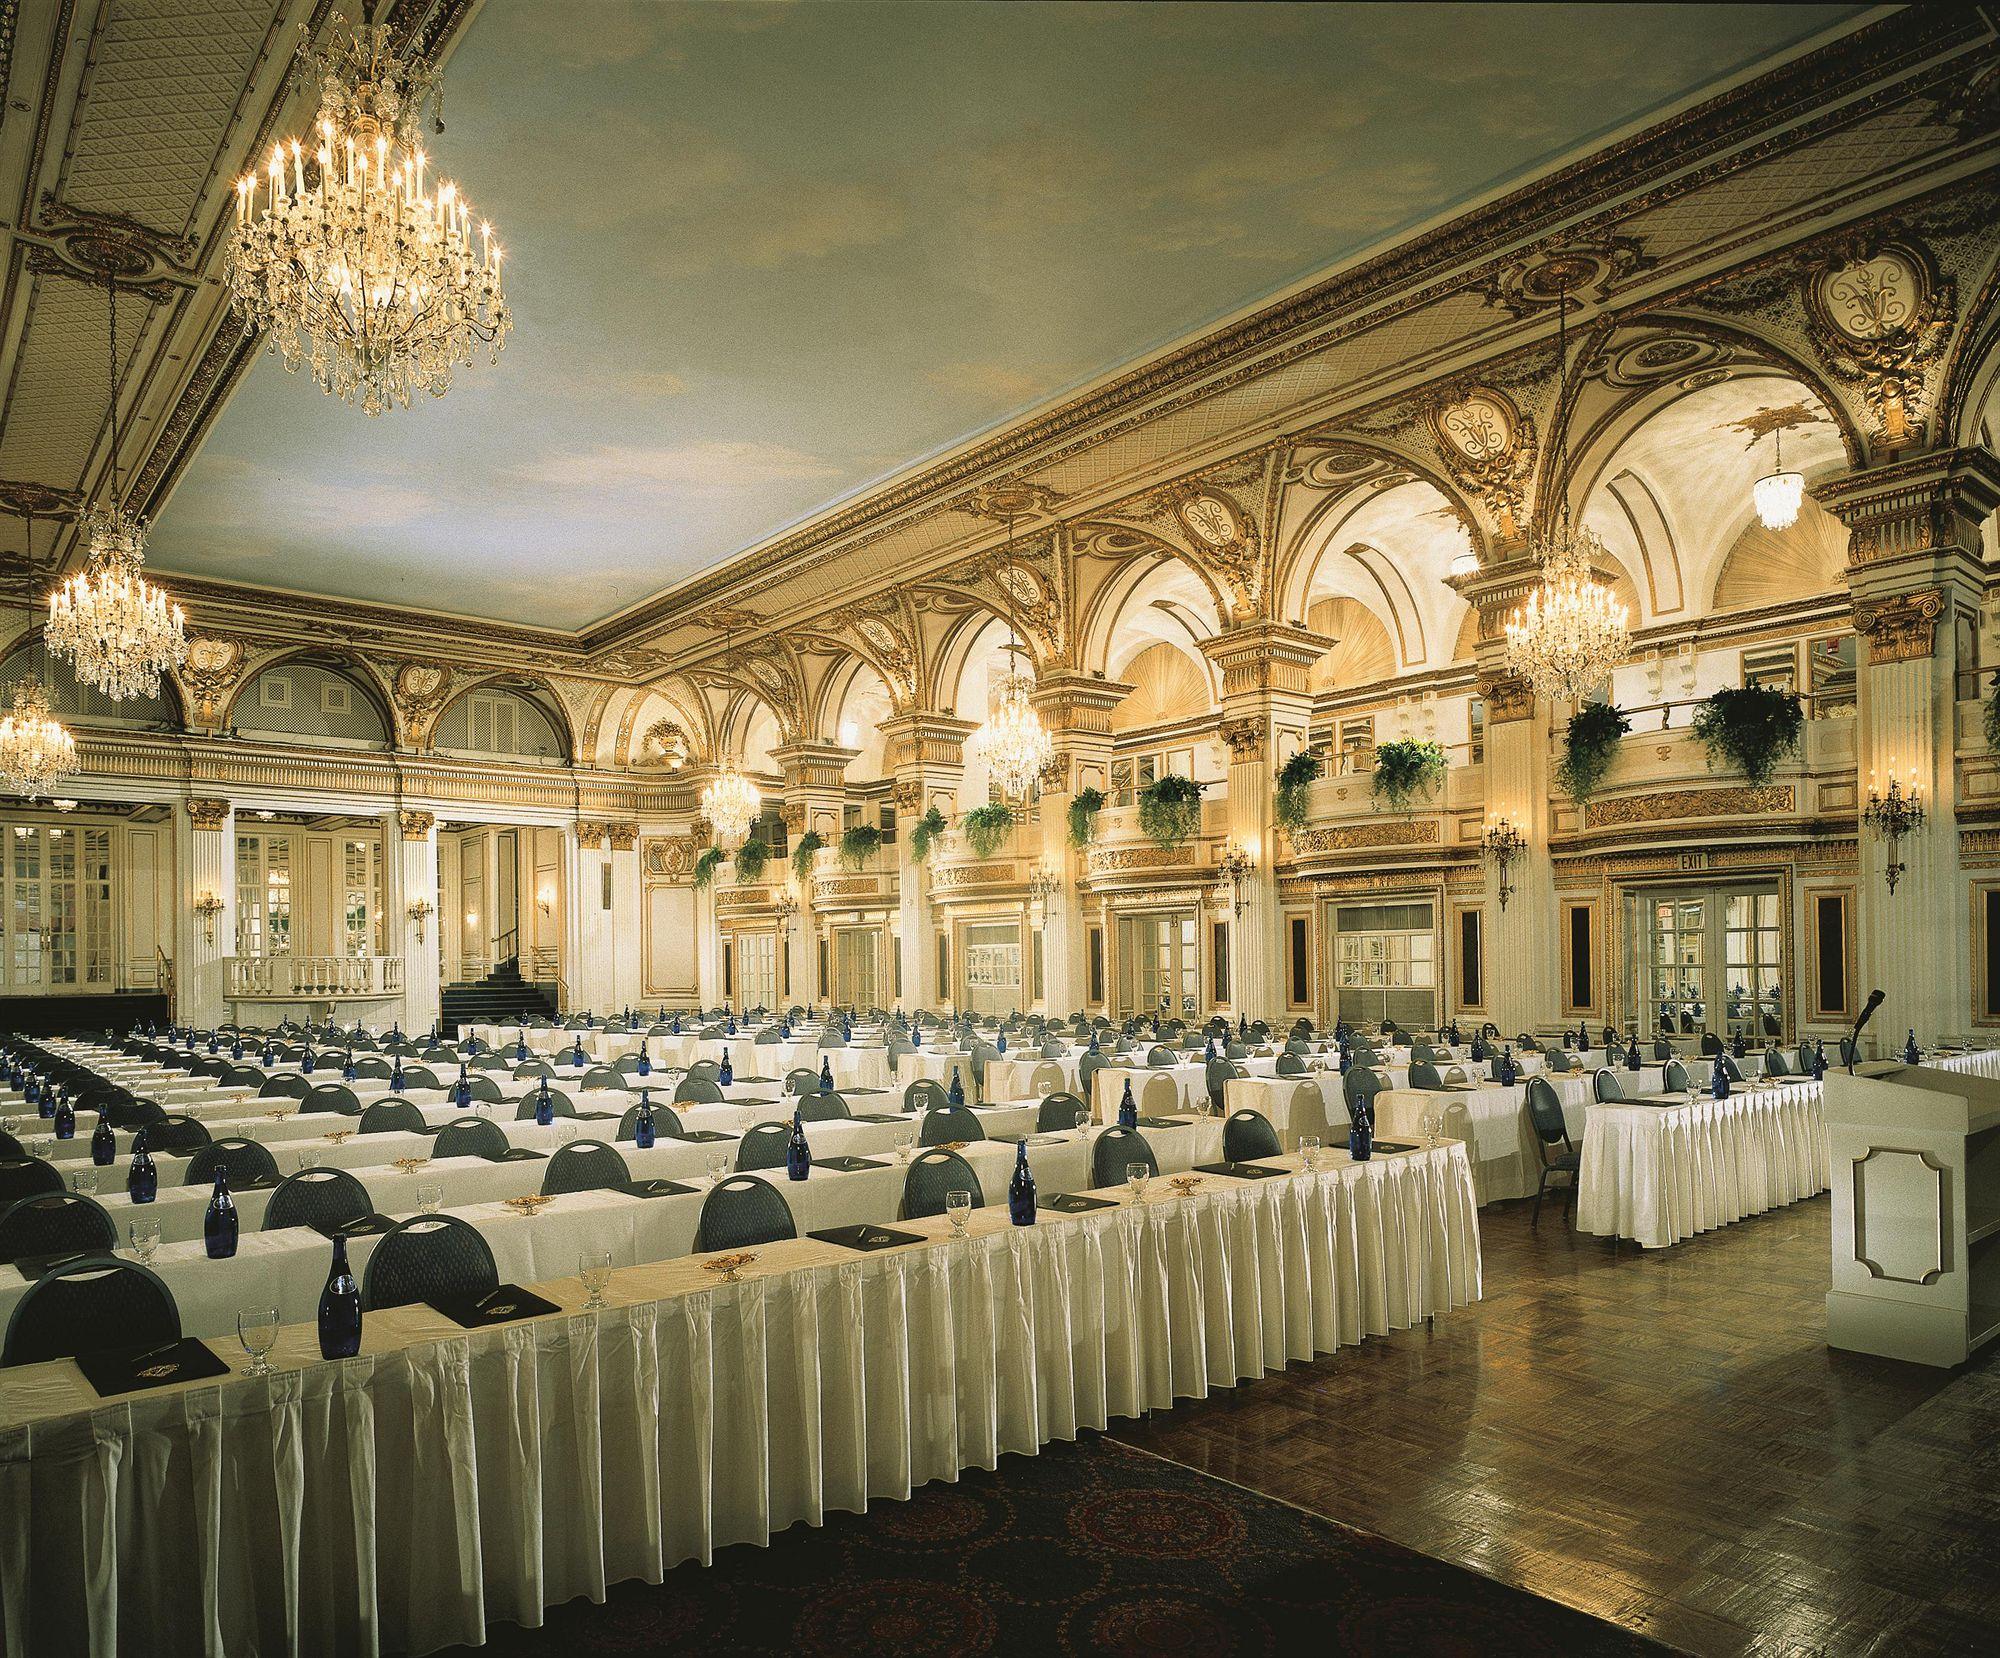 Boston Hotel Coupons for Boston, Massachusetts - FreeHotelCoupons.com